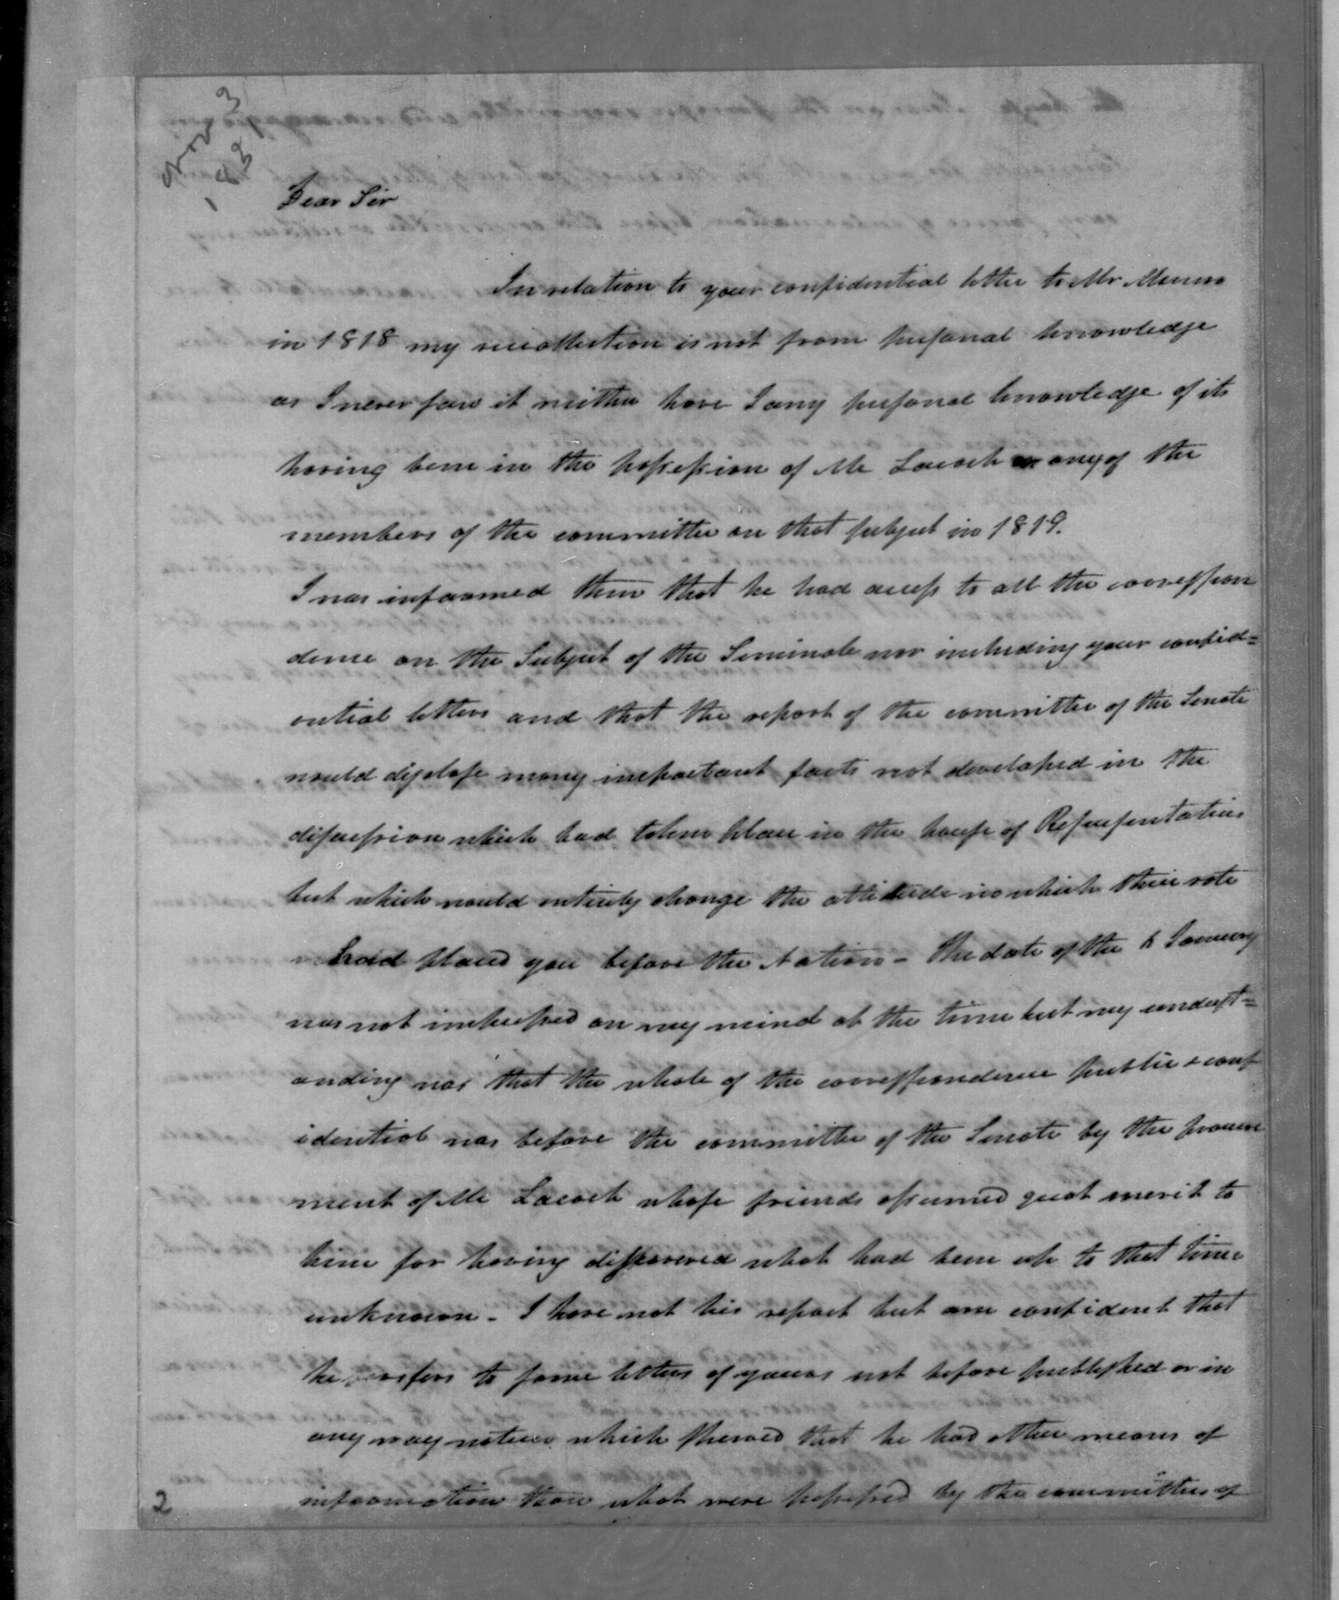 Henry Baldwin to Andrew Jackson, November 3, 1831